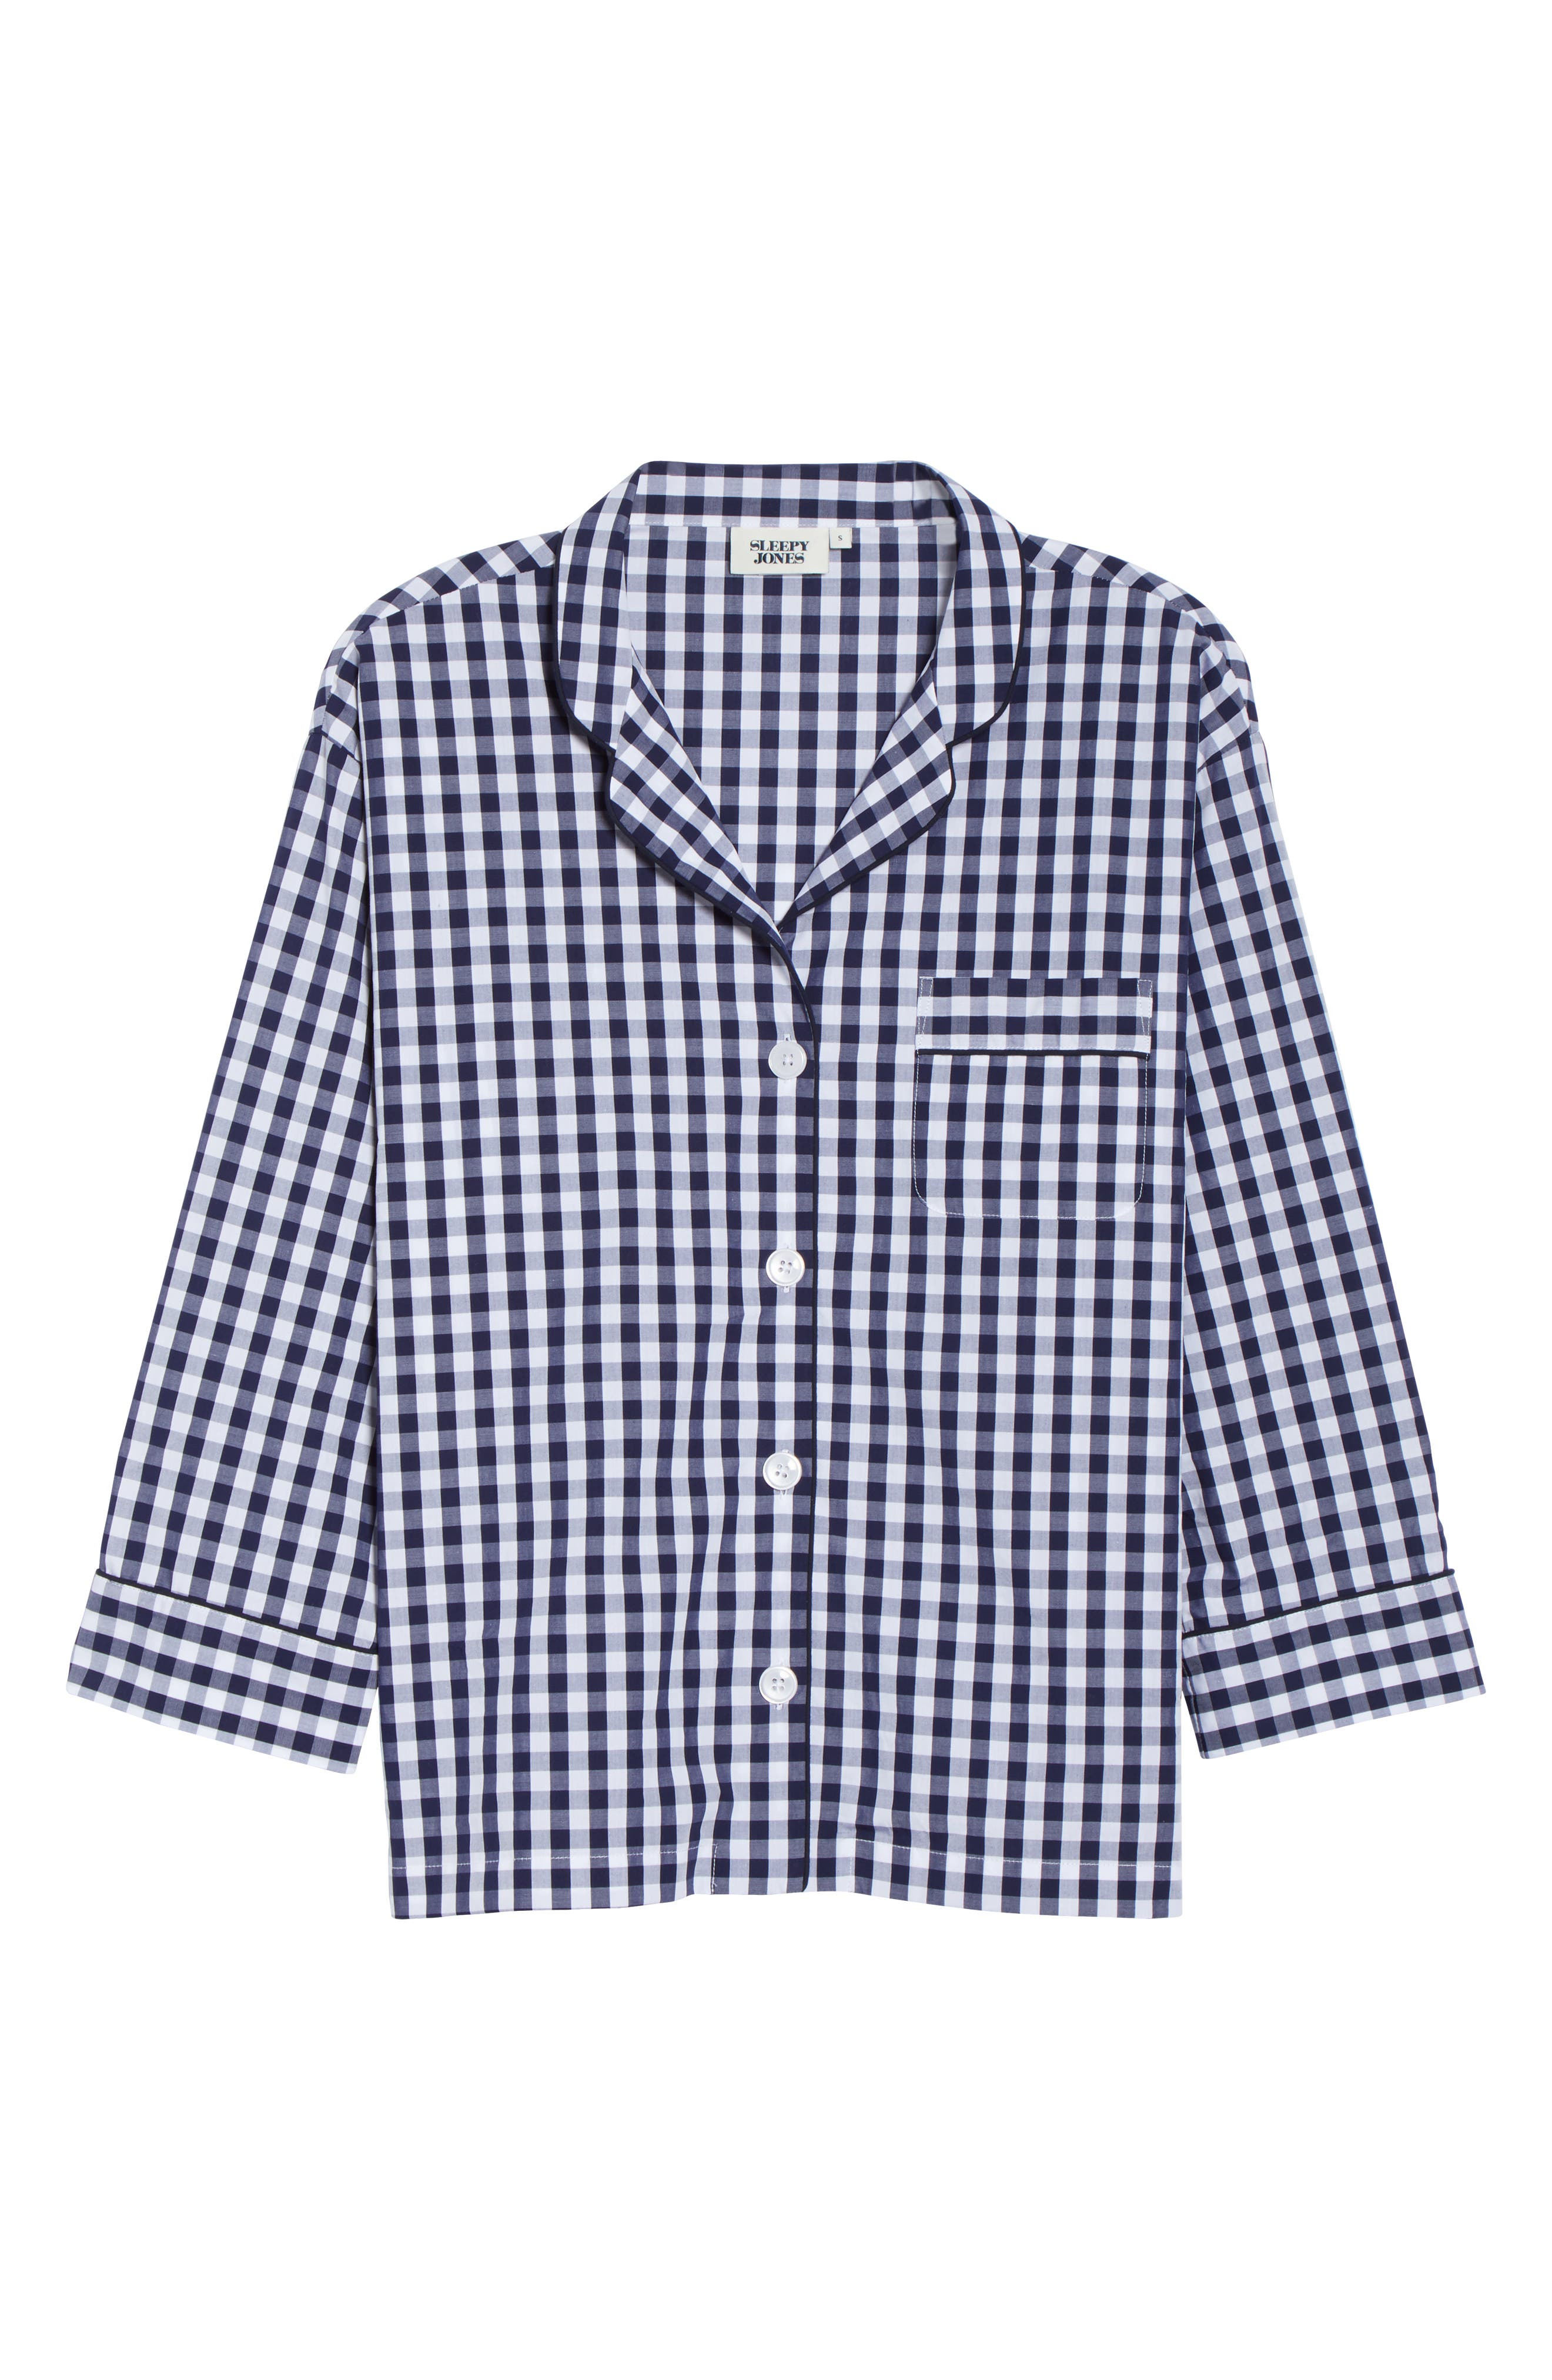 Marina Women's Pajama Shirt,                             Main thumbnail 1, color,                             LARGE GINGHAM BLUE